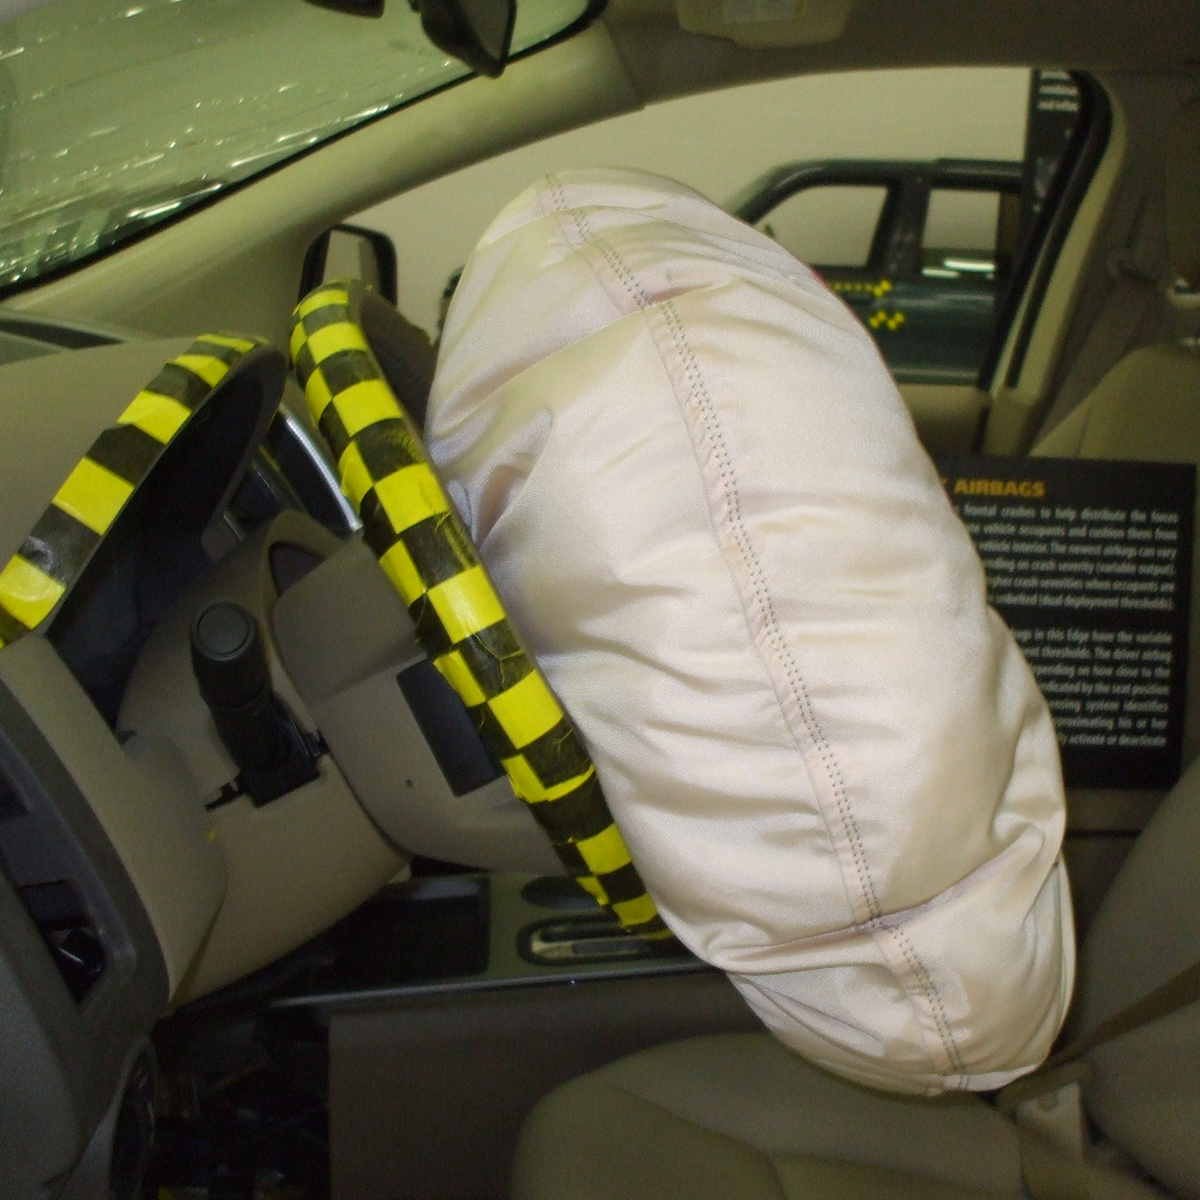 Airbag Warning Light Is On Inspection Autoguru 1998 Subaru Outback Dash Lights 1200x1200